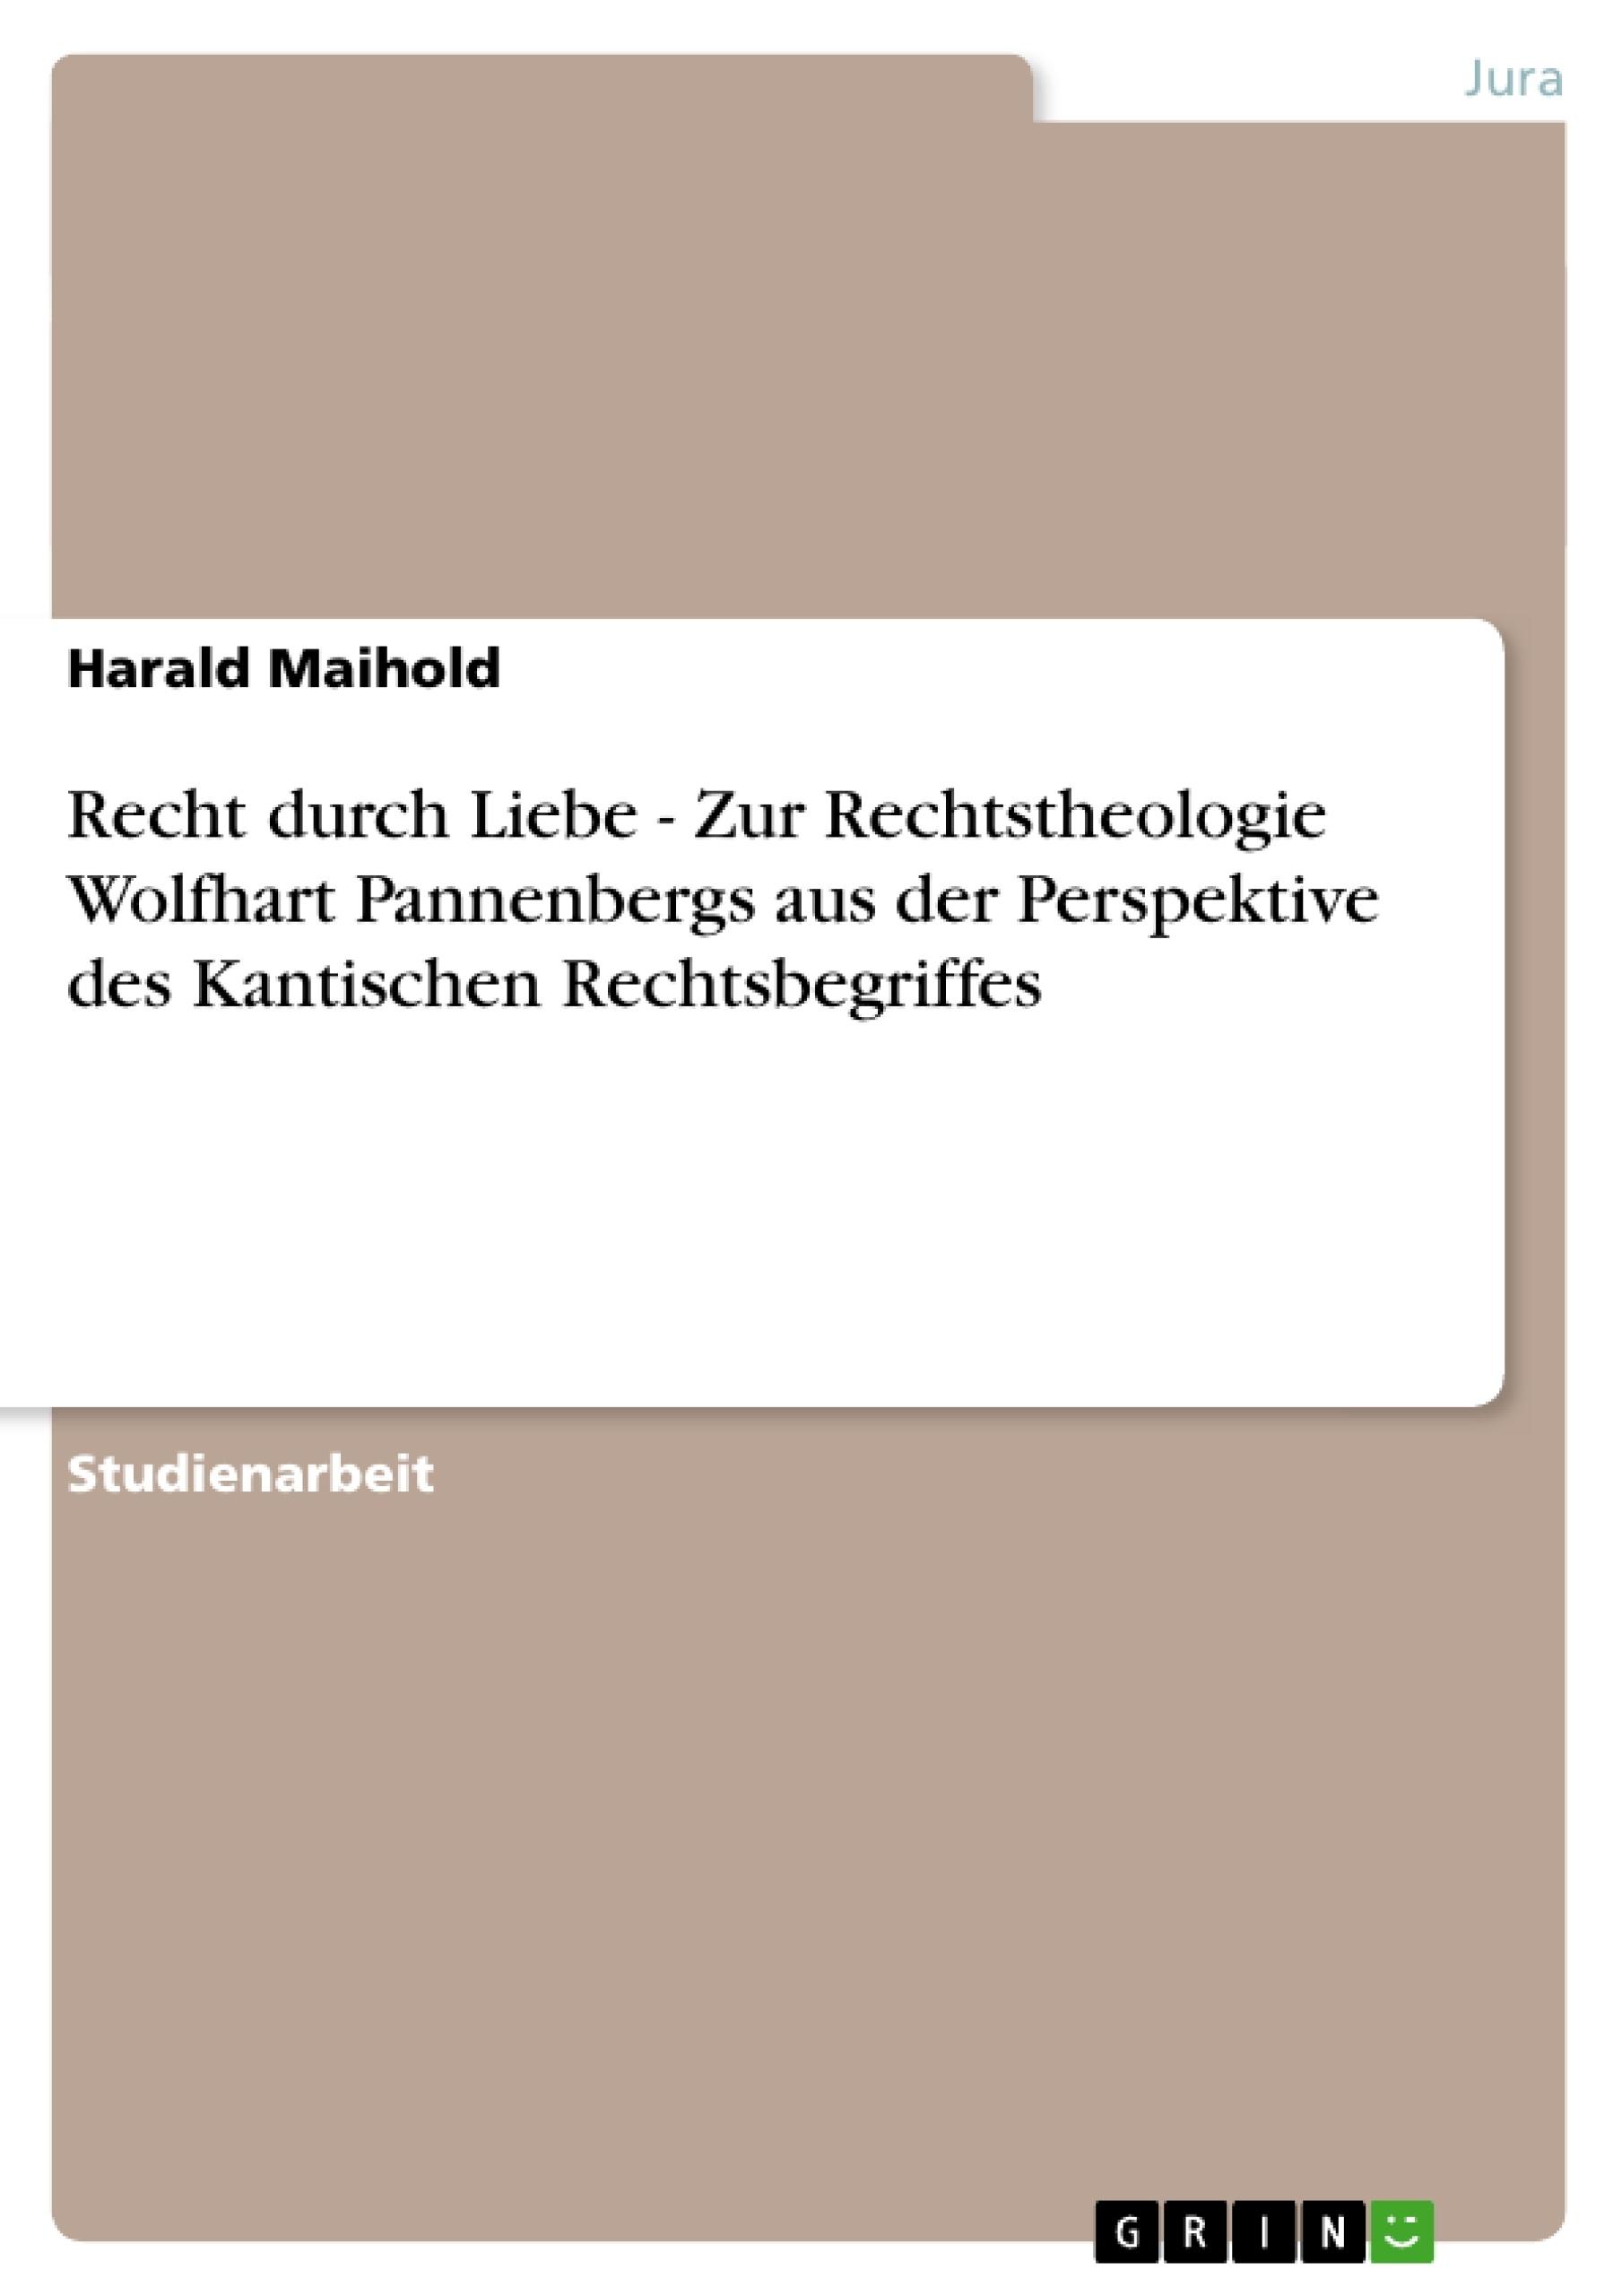 Titel: Recht durch Liebe - Zur Rechtstheologie Wolfhart Pannenbergs aus der Perspektive des Kantischen Rechtsbegriffes